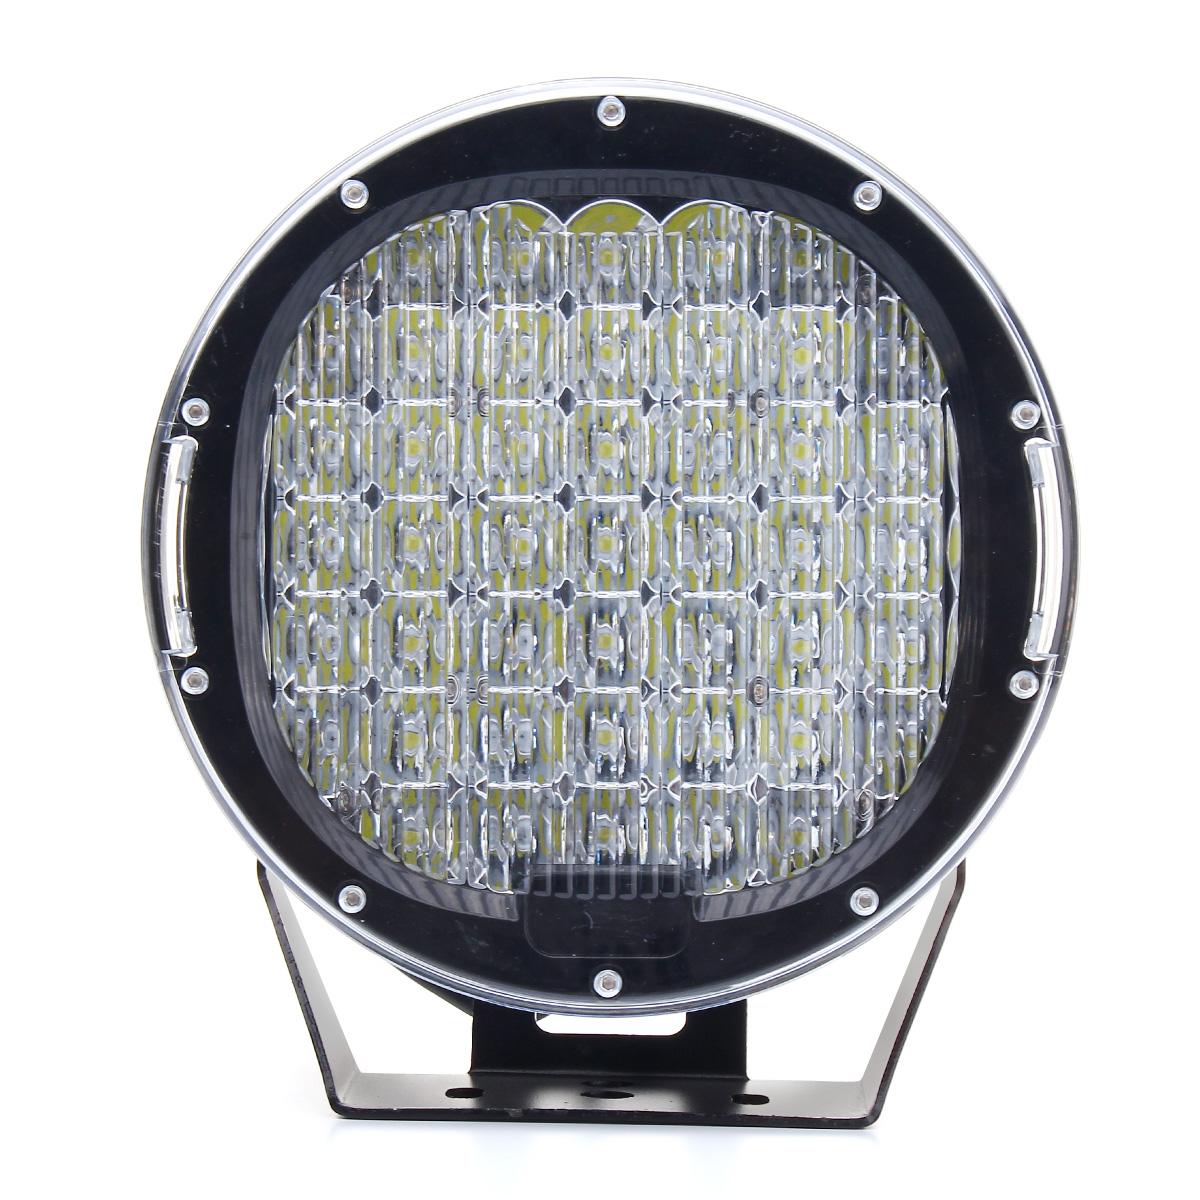 9inch 225W LED Round Work Light Spot Driving Head Light Offroad ATV Truck  Lamp